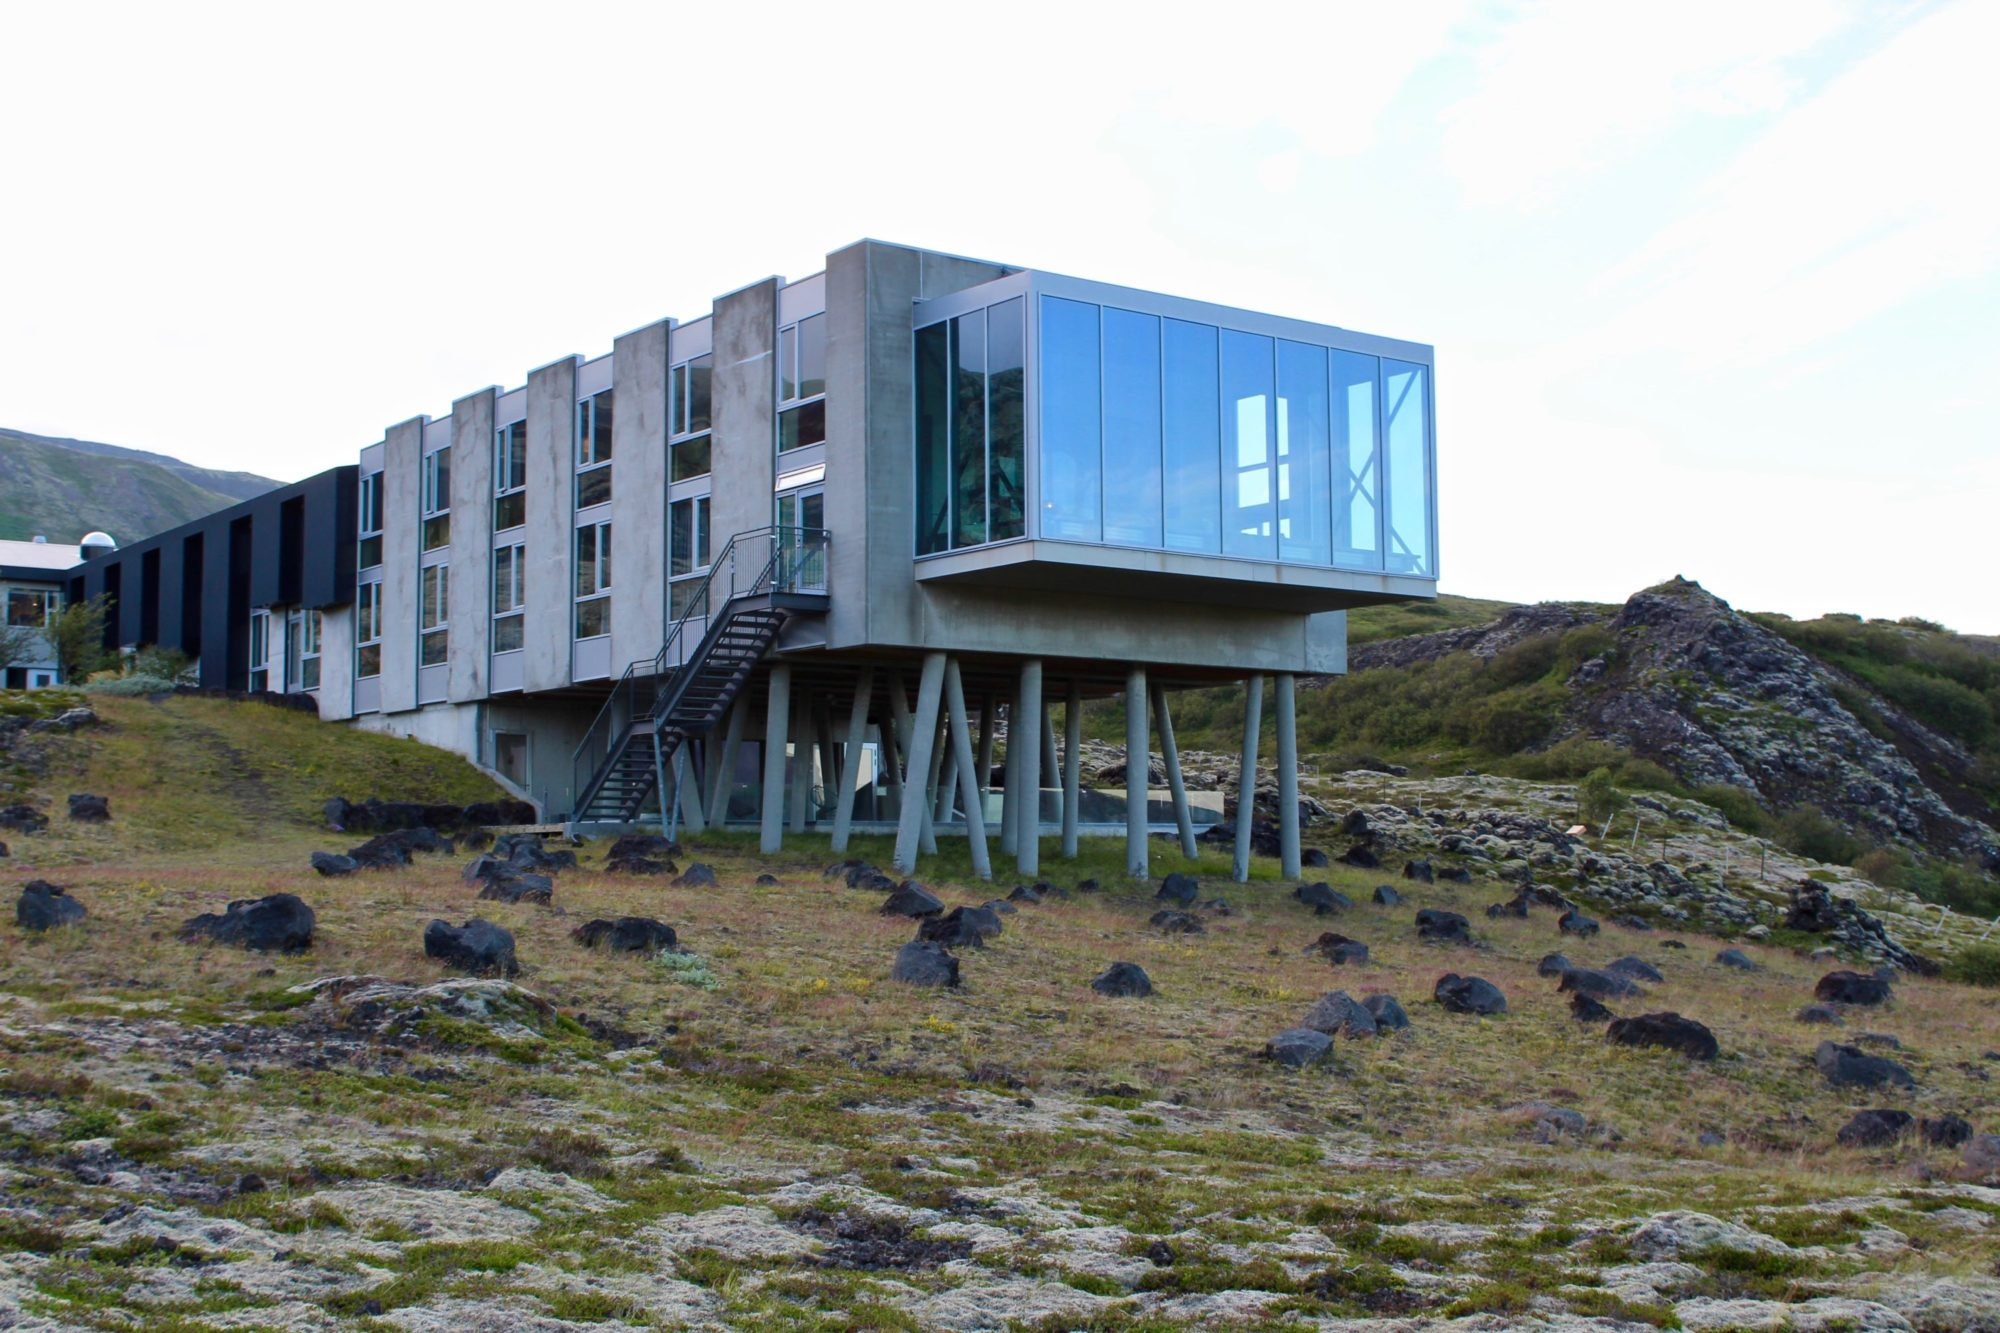 IMG 1353 e1535708688114 ICELAND ROAD TRIP